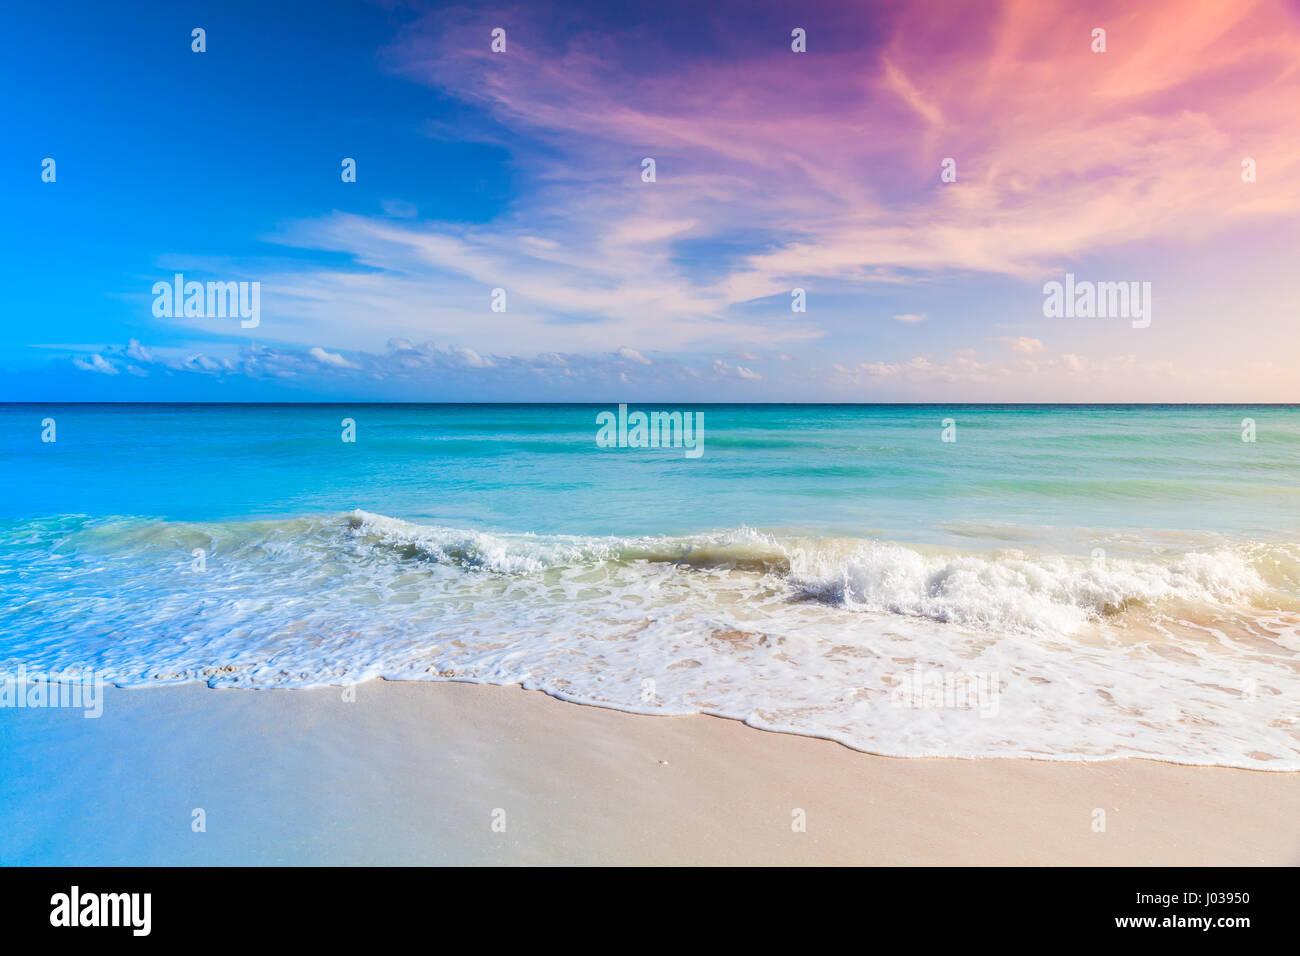 Tropical Beach Background White Sand And Azure Shore Water Under Cloudy Blue Sky Caribbean Sea Coast Dominican Republic Saona Island Tonal Correc